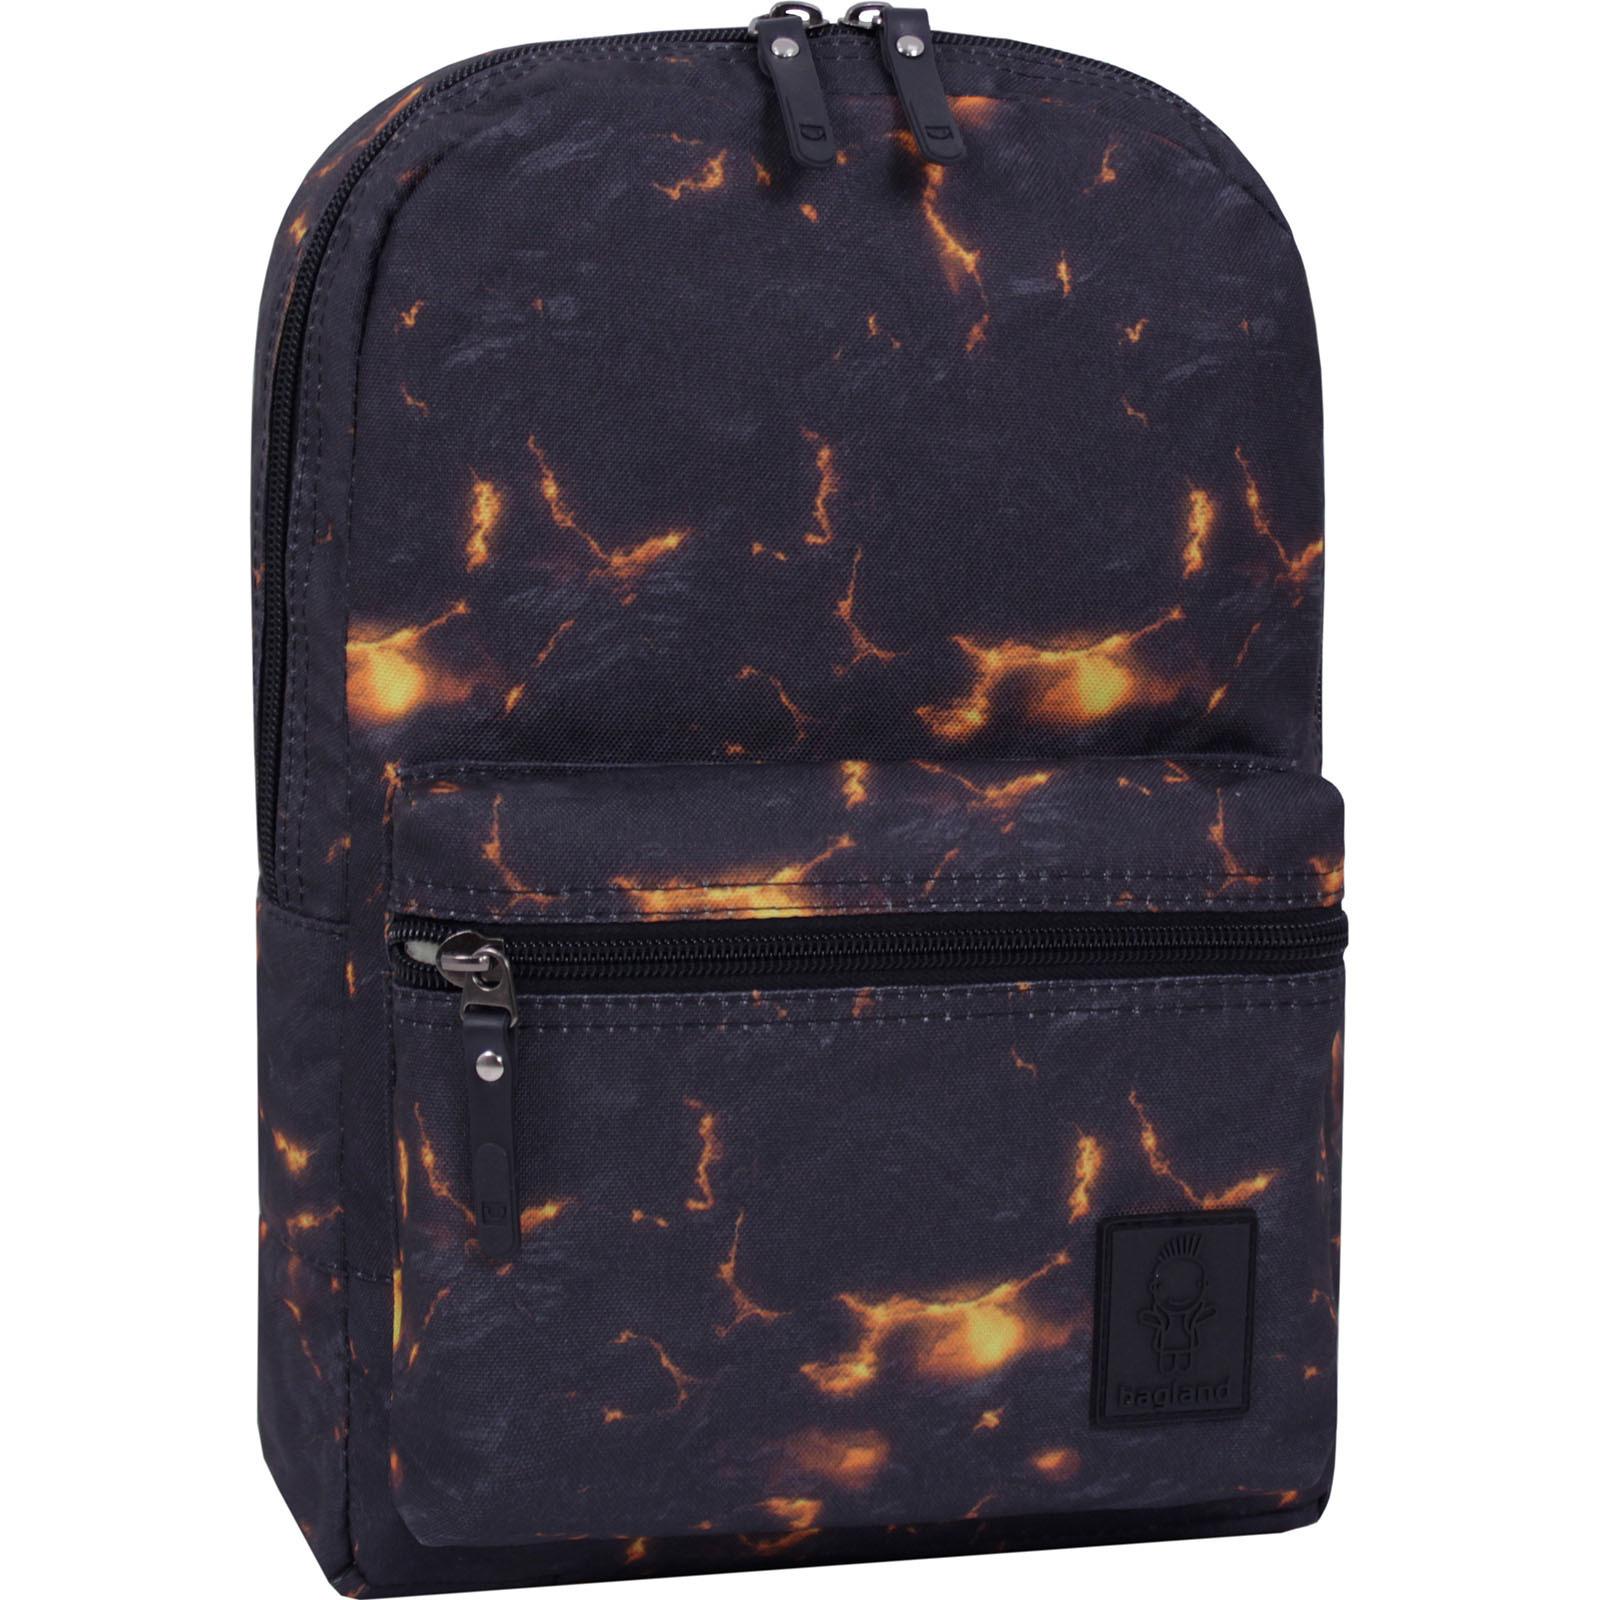 Молодежные рюкзаки Рюкзак Bagland Молодежный mini 8 л. сублимация 83 (00508664) IMG_6660_суб.83_.JPG